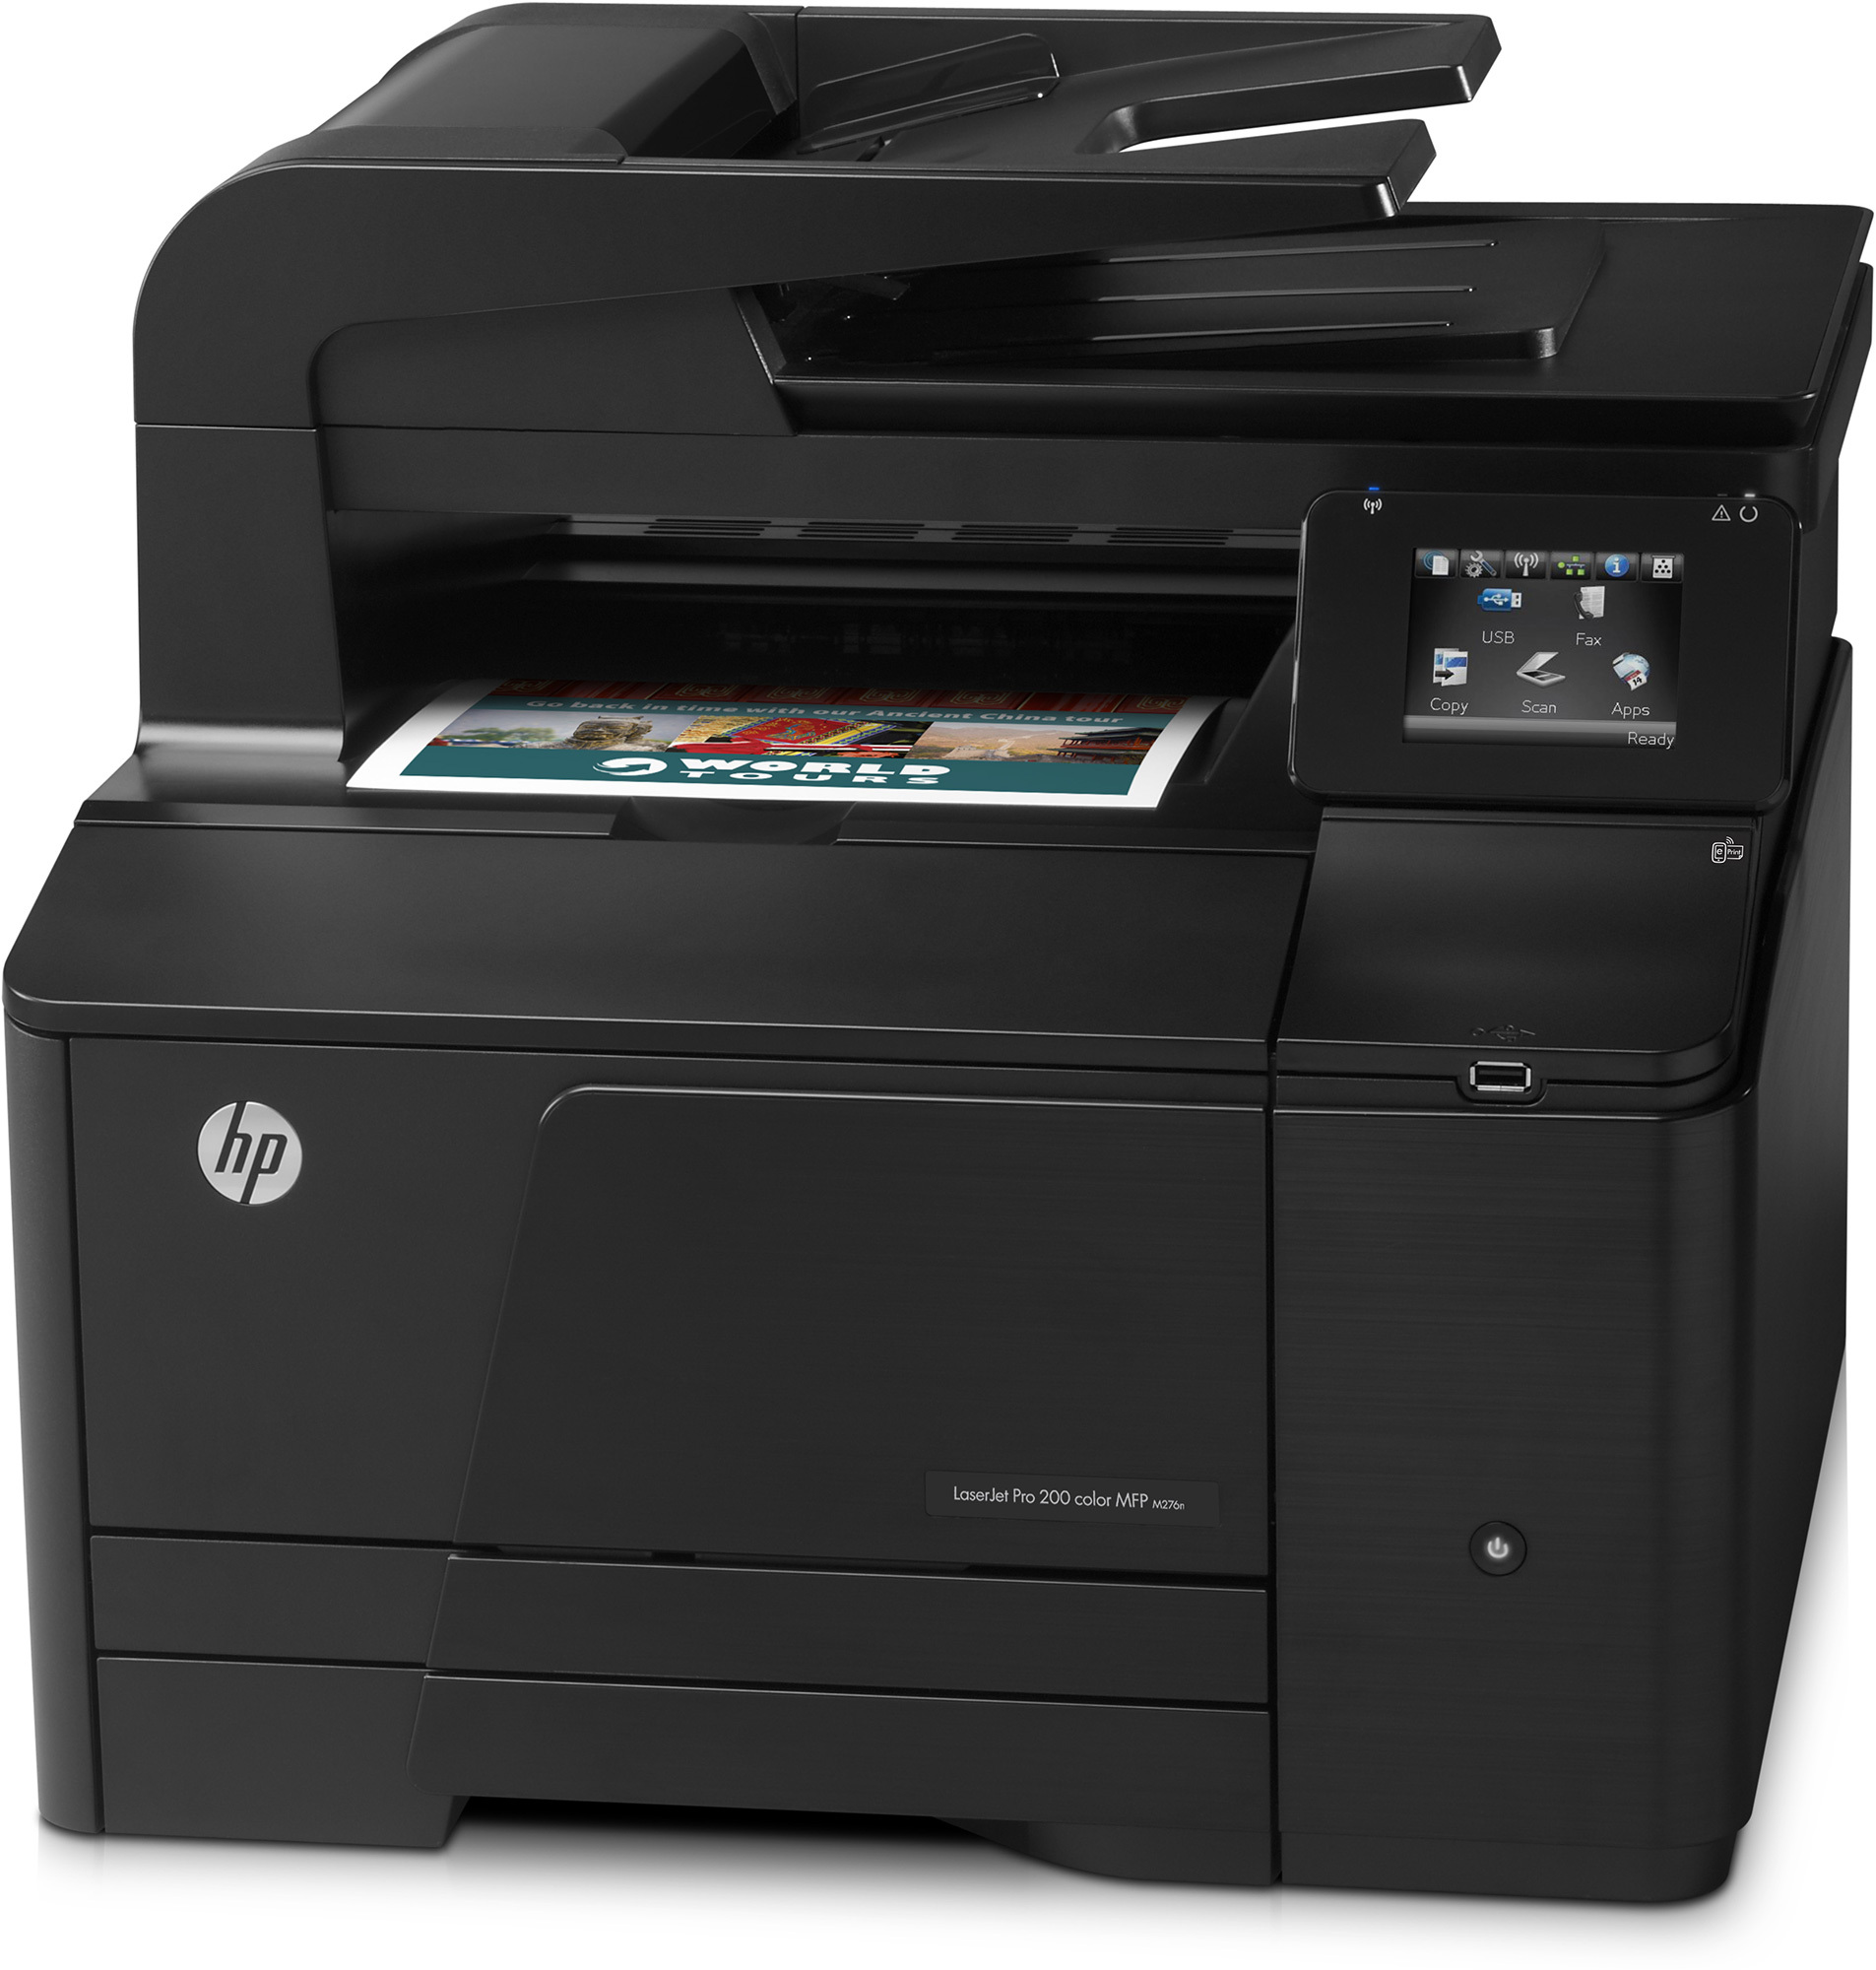 Hp Color Laserjet Pro 200 Mfp M276n Tonerimpresoras